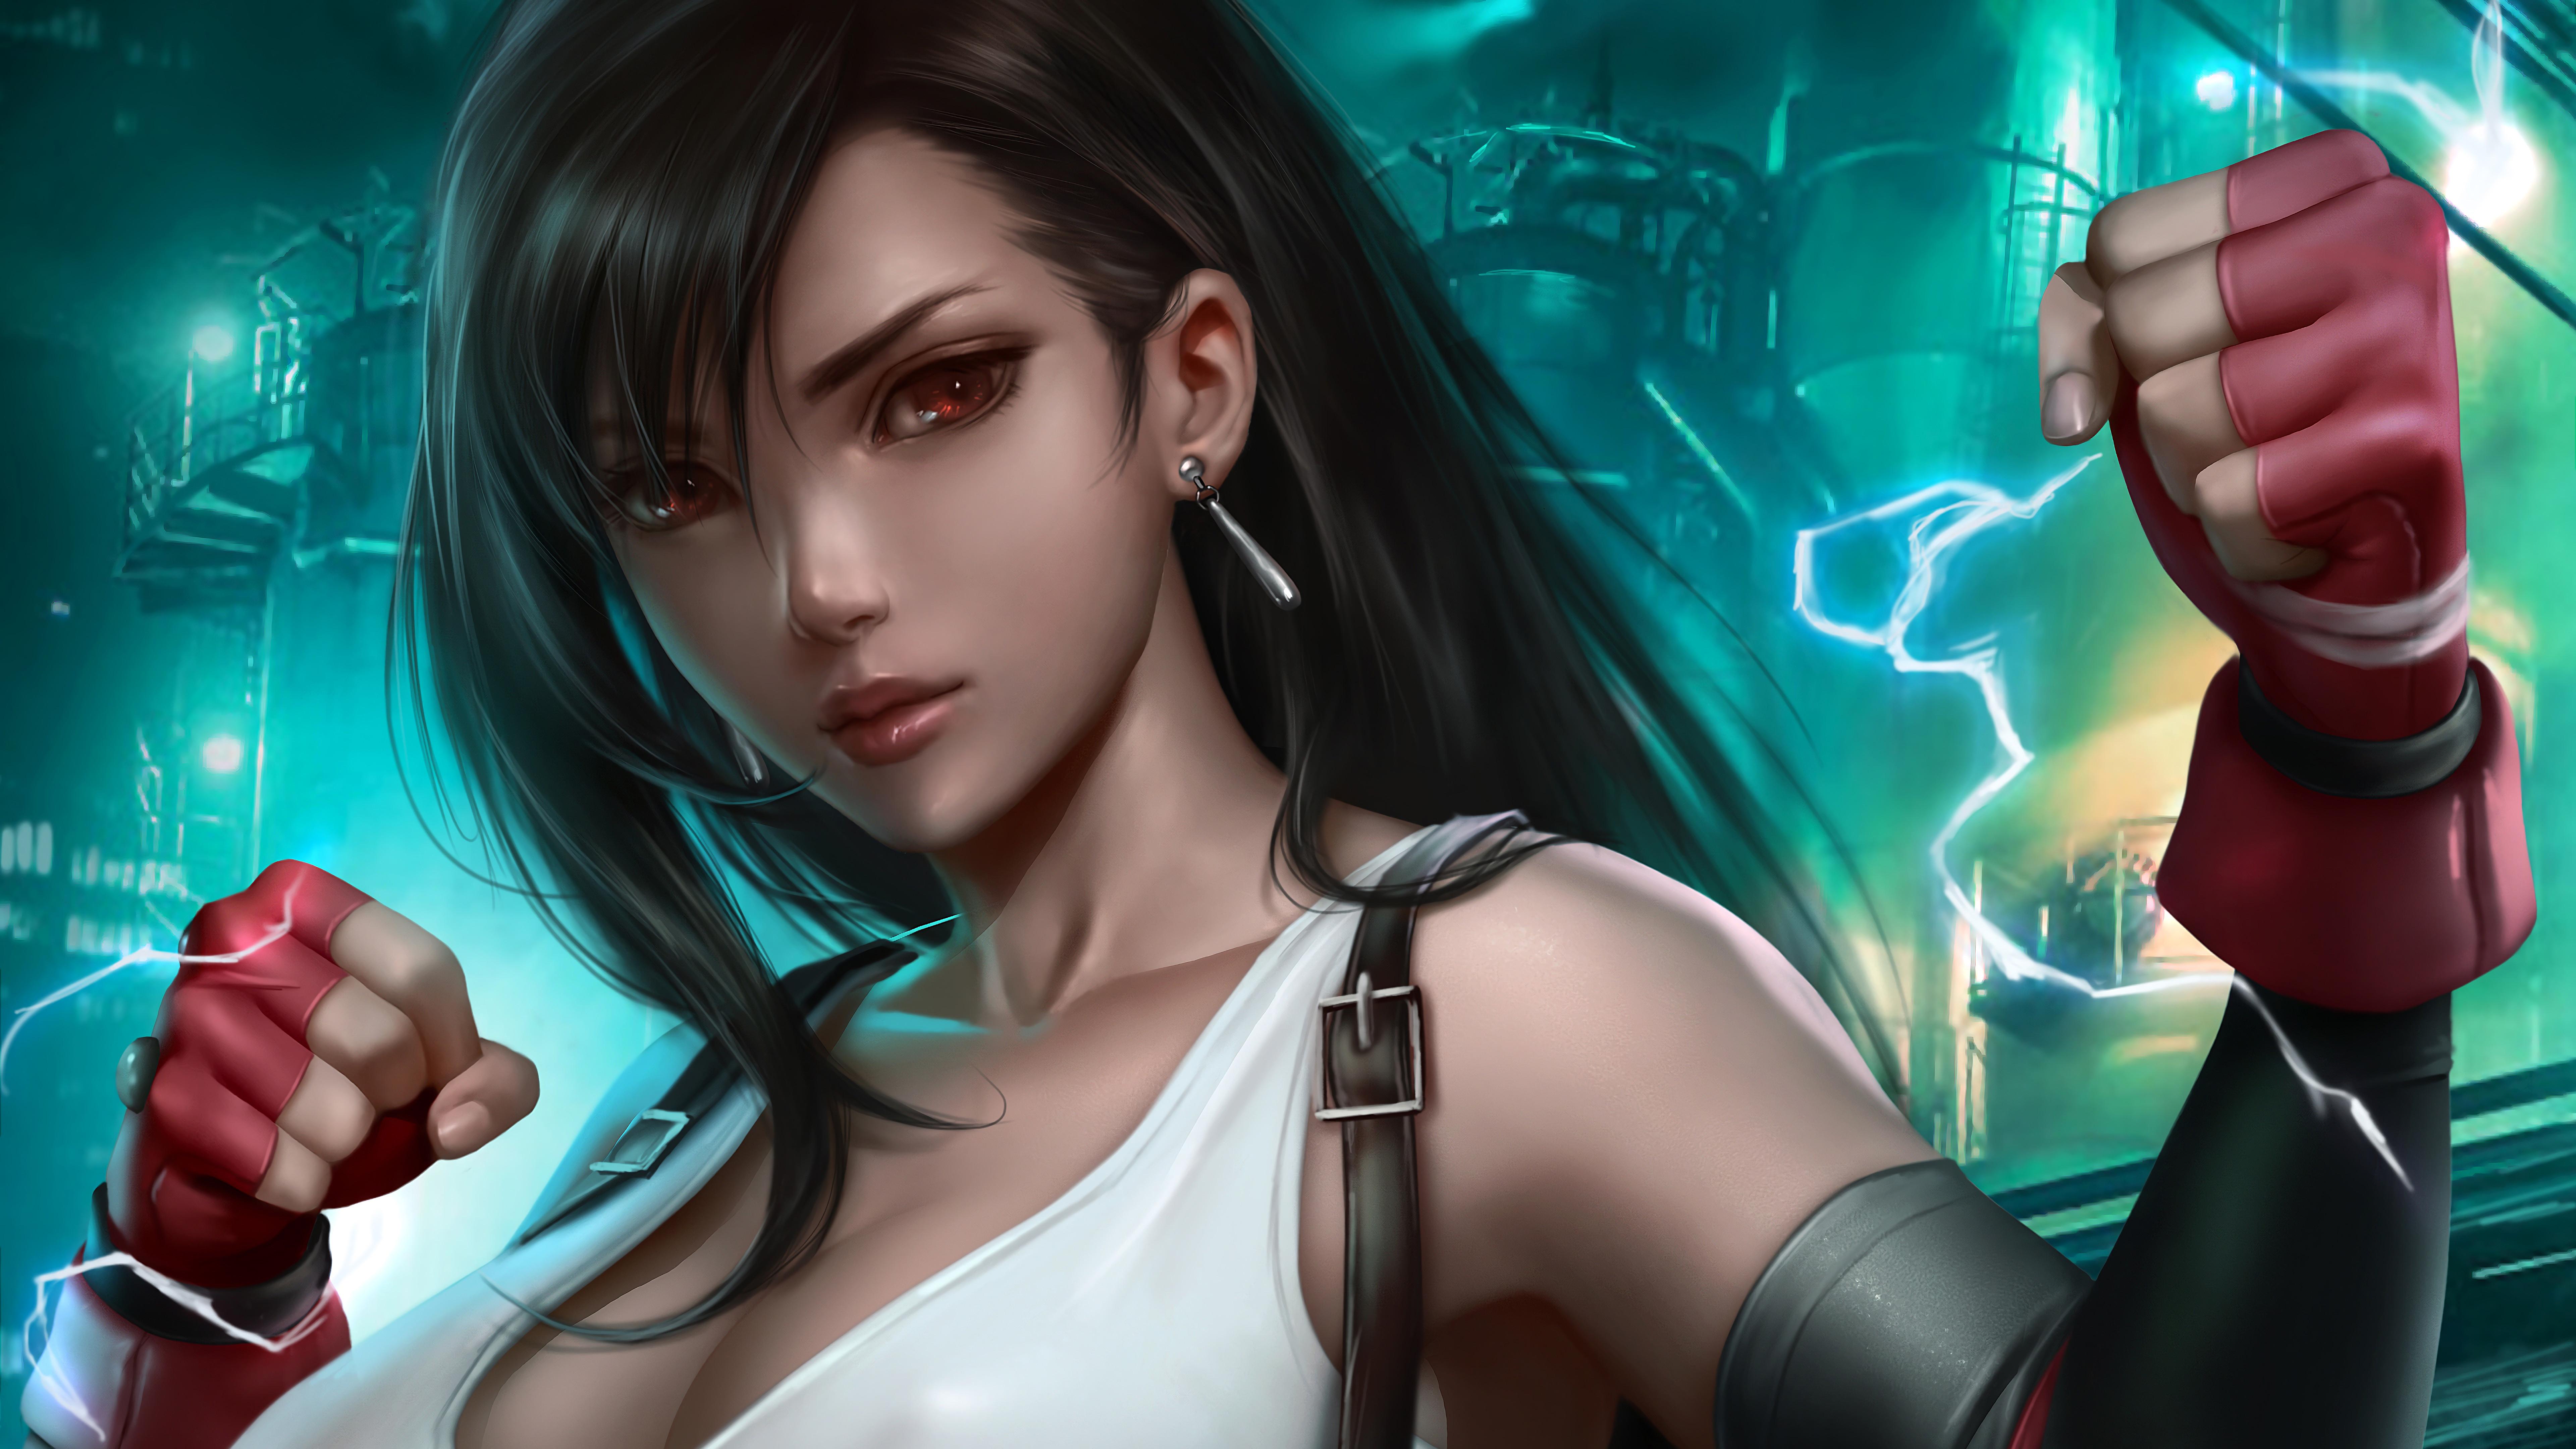 Tifa Lockhart, Final Fantasy 7 Remake, 4K, #37 Wallpaper